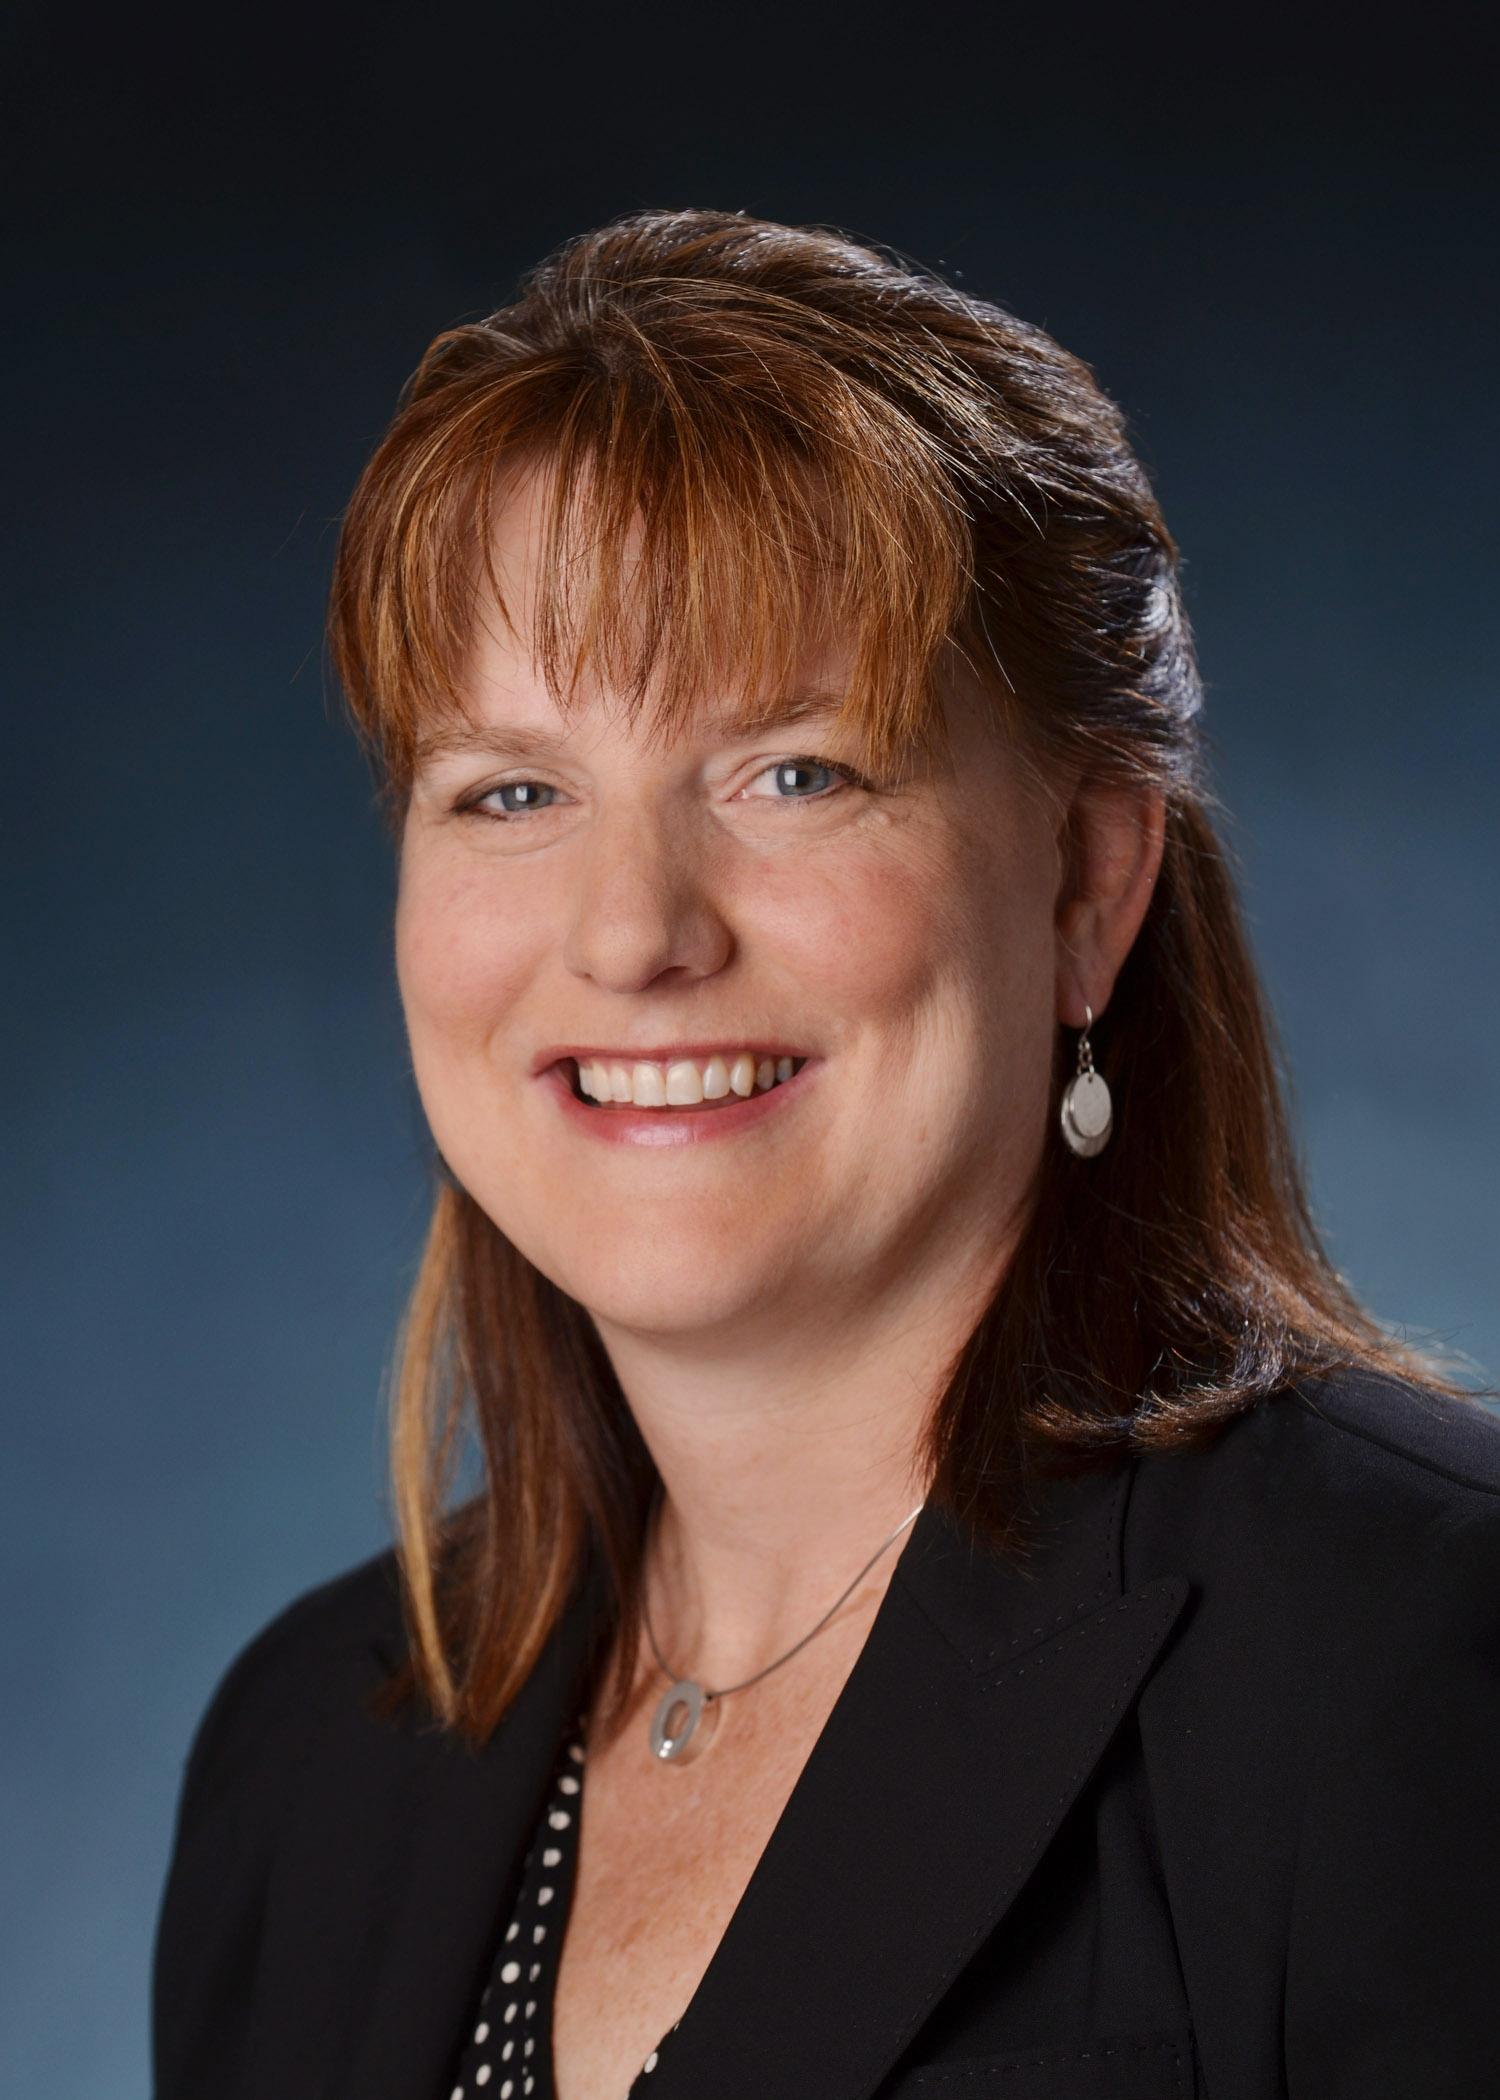 Kelly Fox, Senior Vice Chancellor and CFO, University of Colorado at Boulder